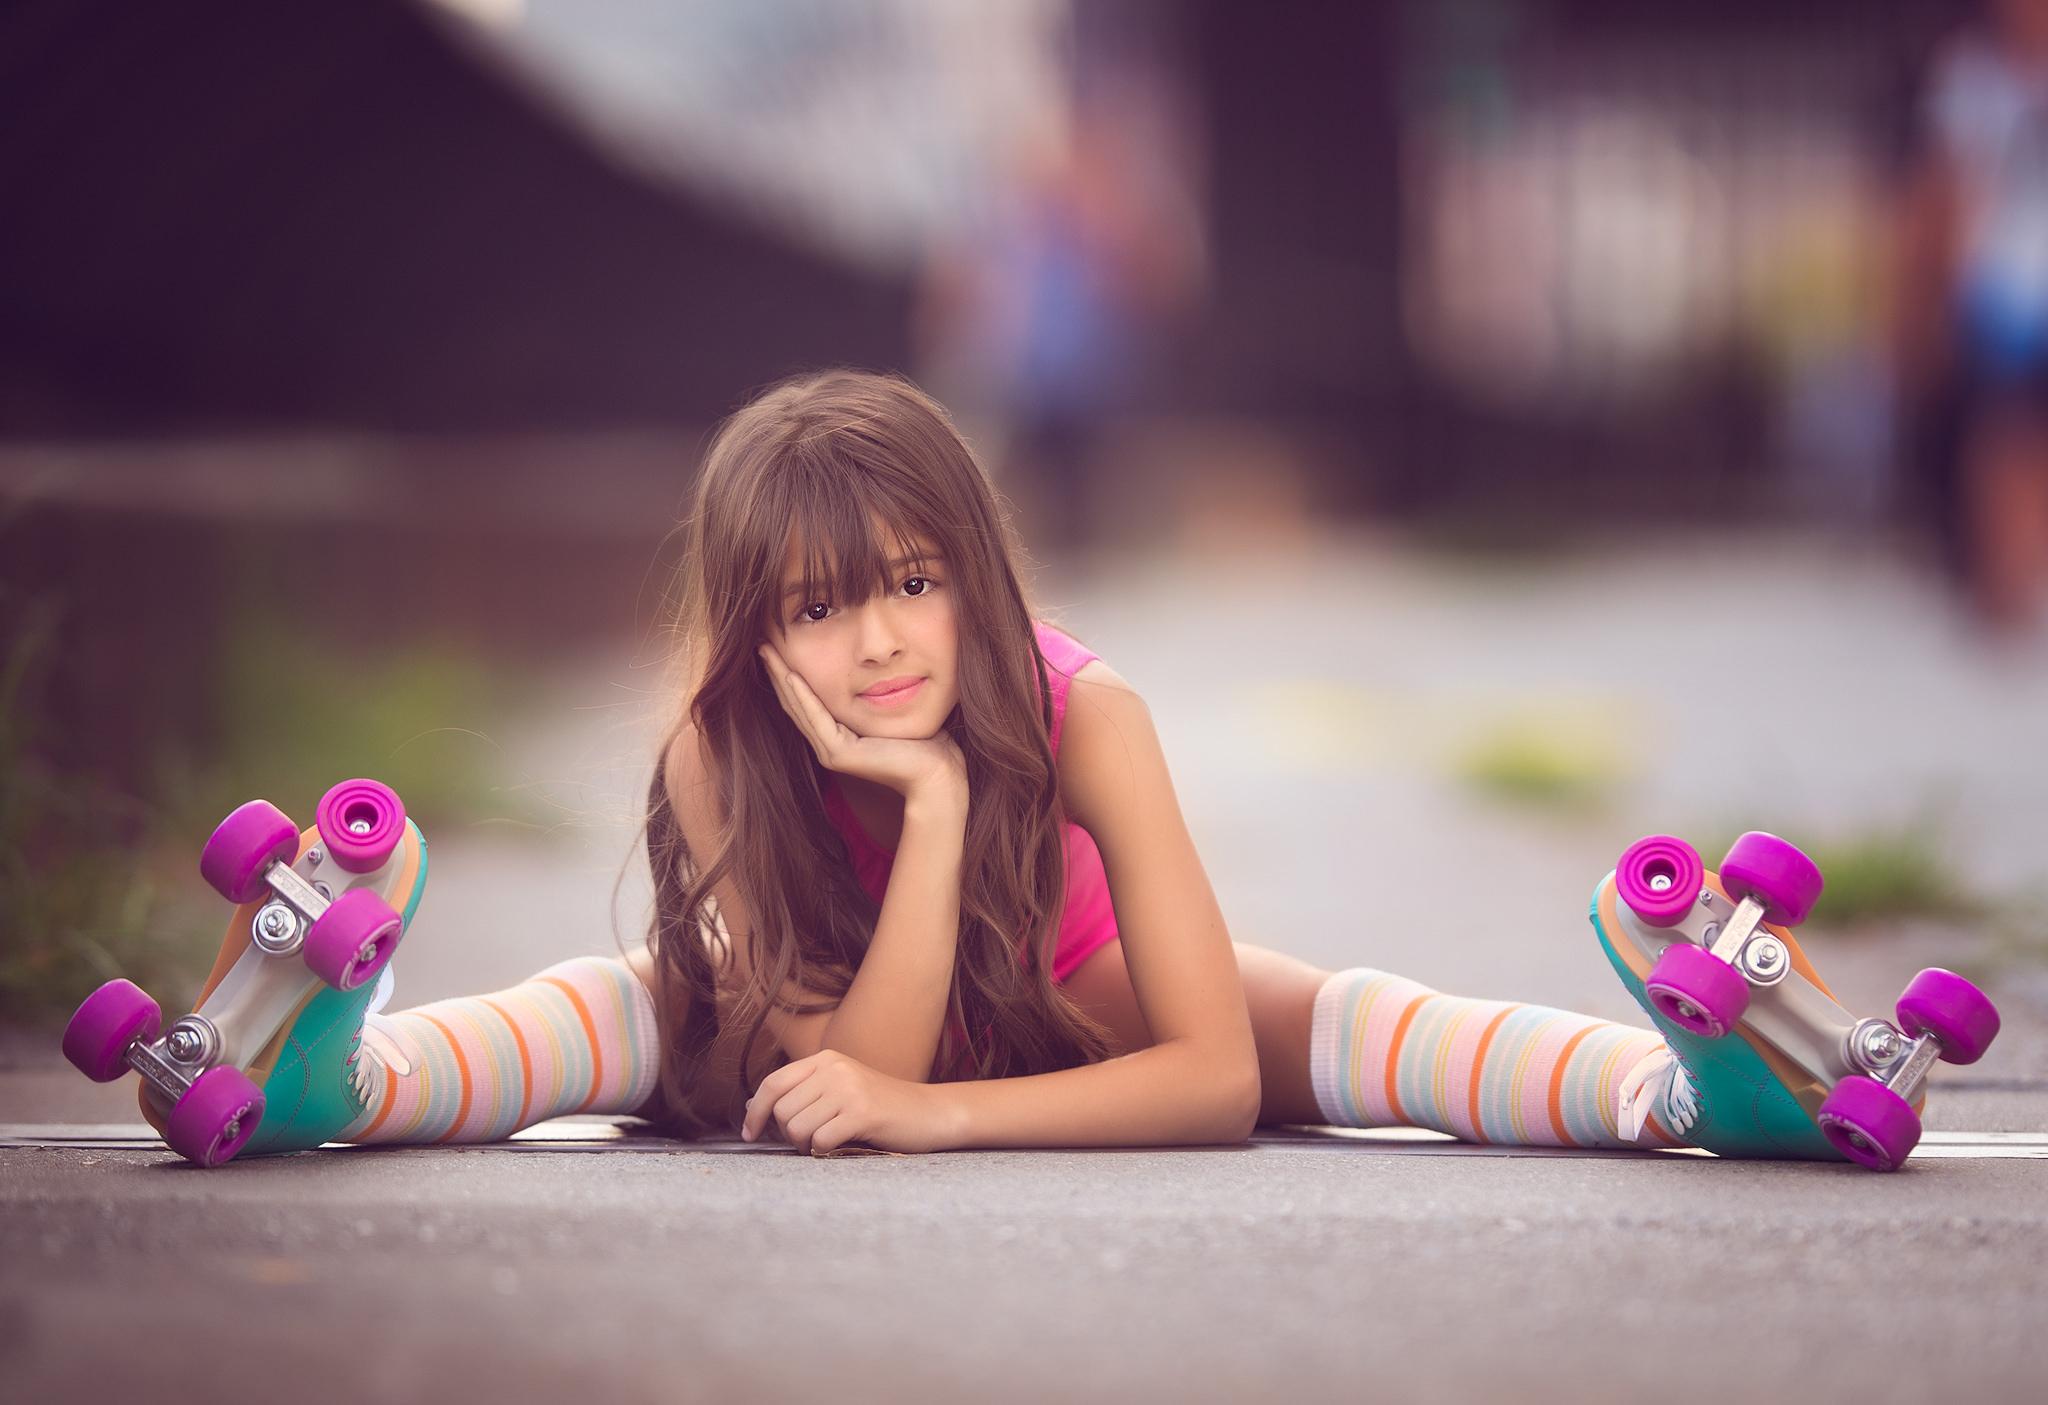 3840x2160 cute little girl skater 4k hd 4k wallpapers - Cute little girl pic hd ...